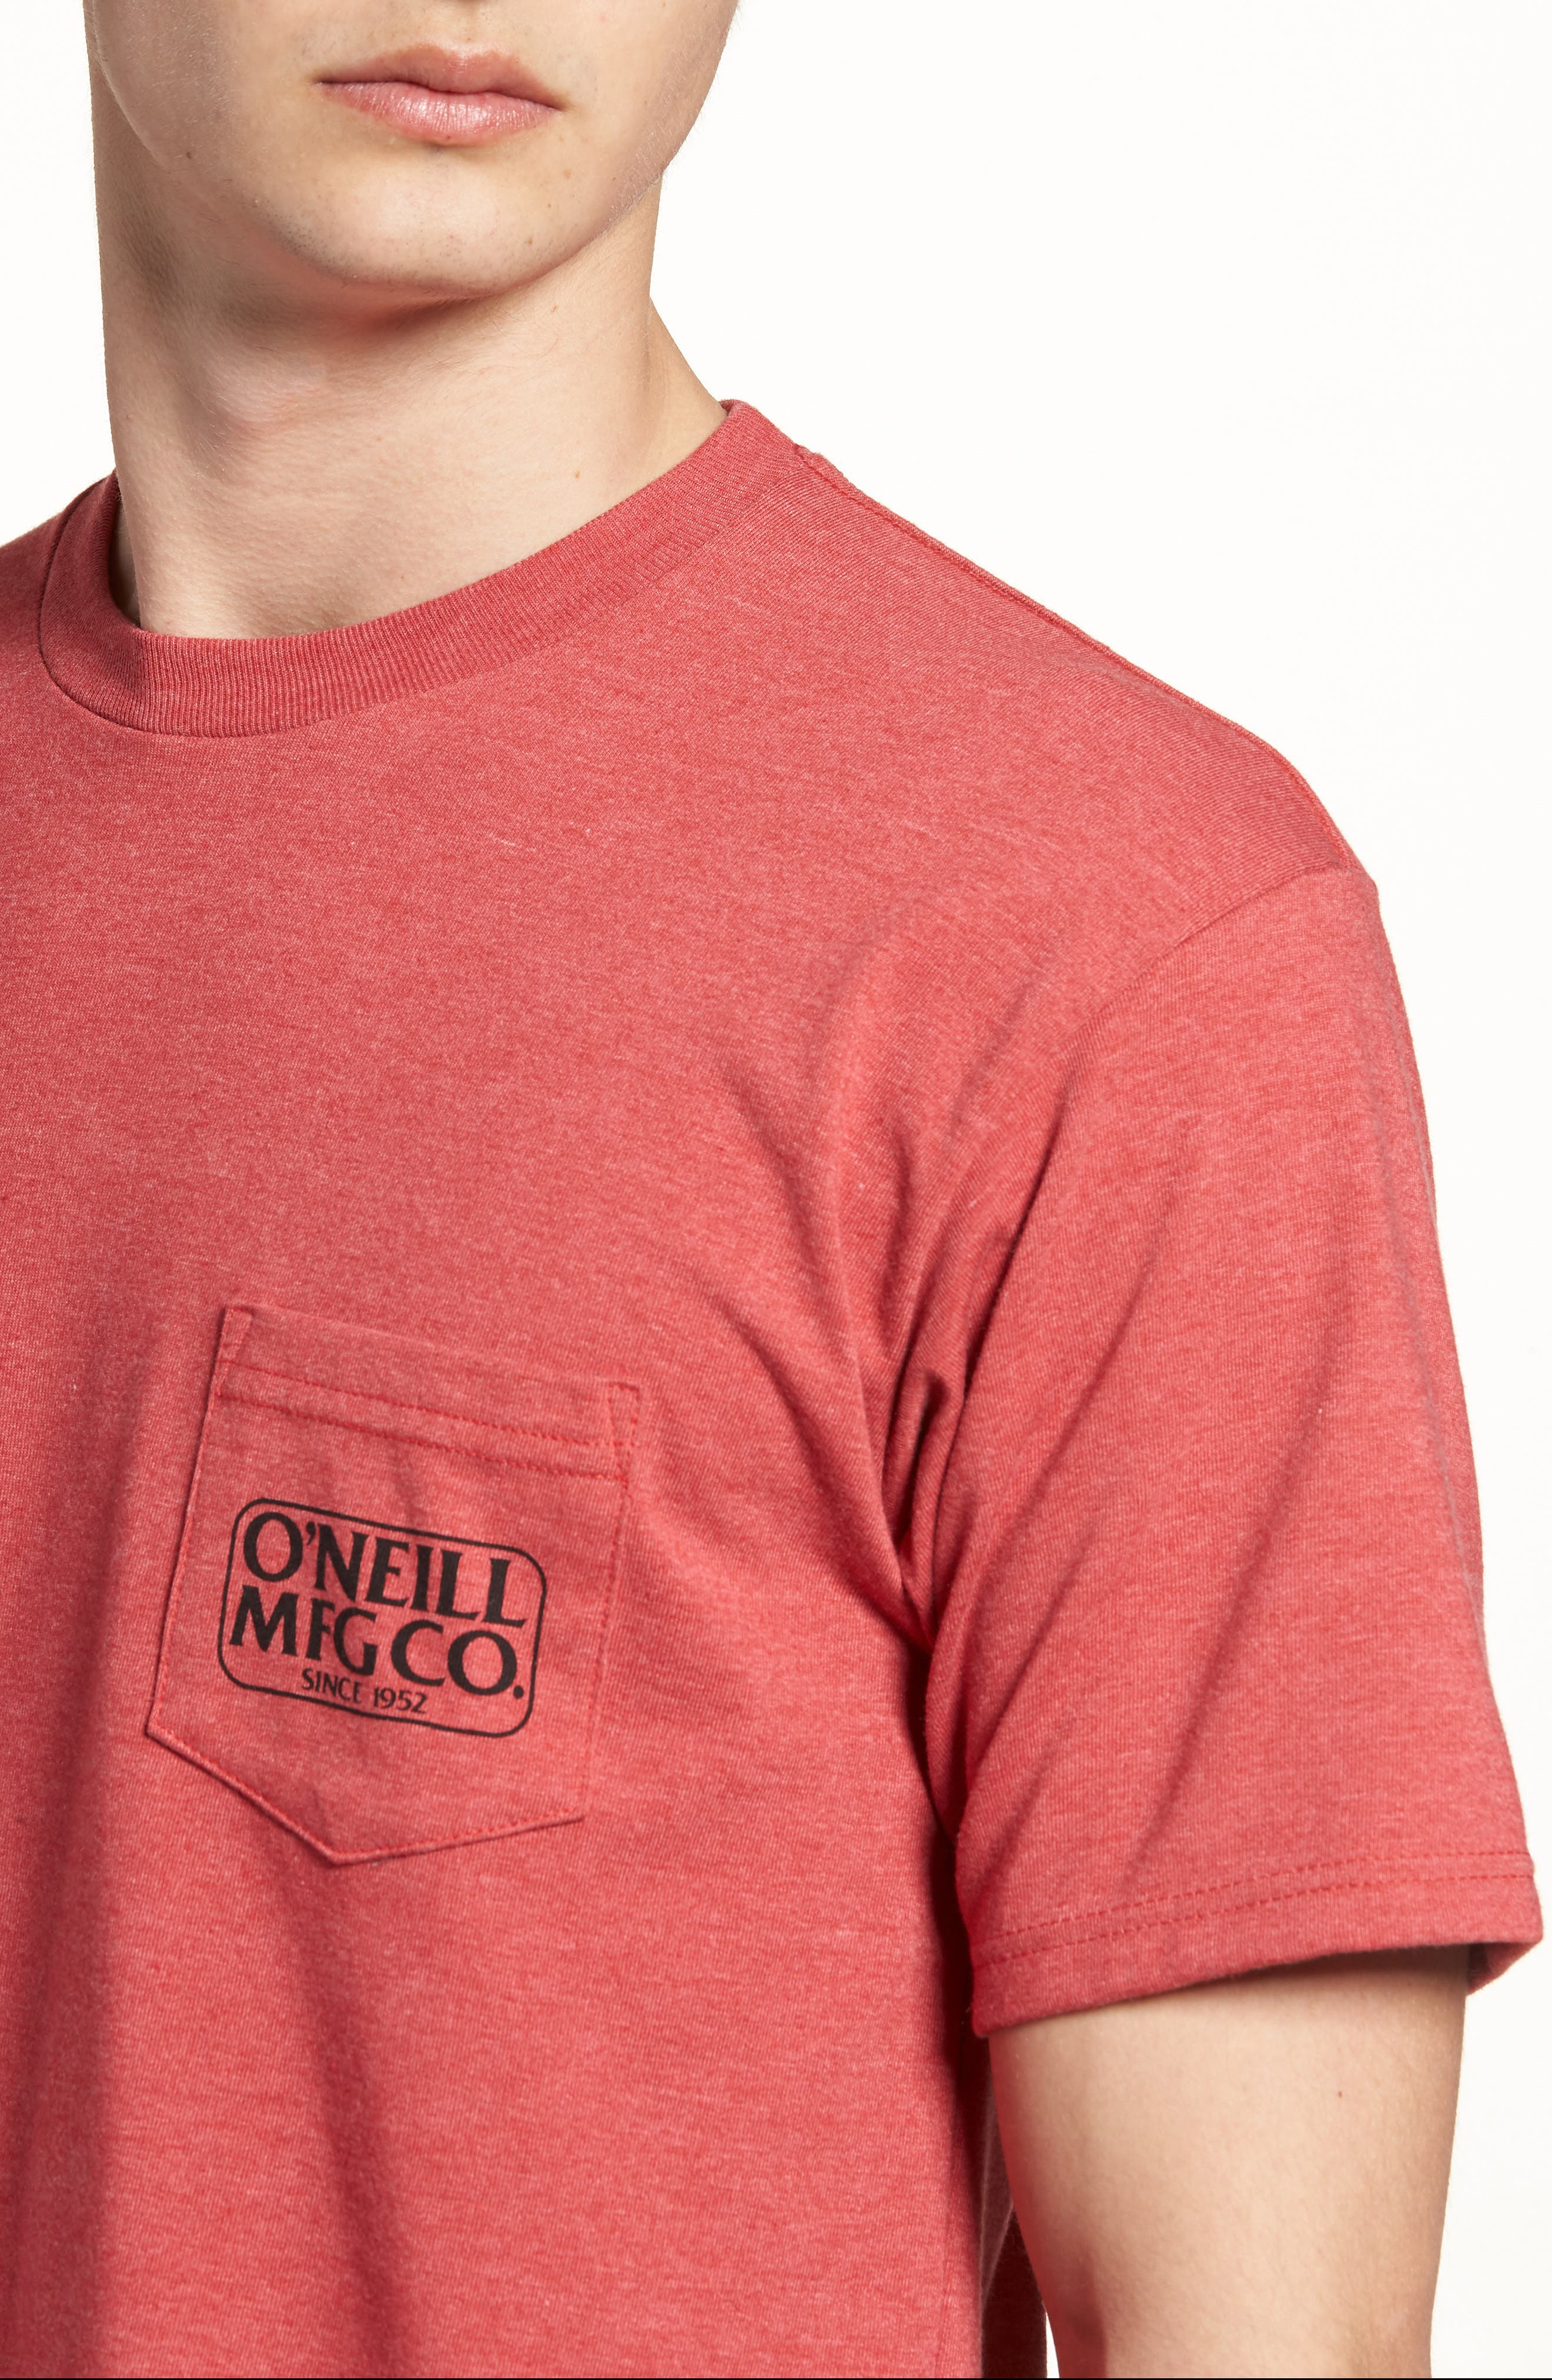 MFG Graphic T-Shirt,                             Alternate thumbnail 4, color,                             601